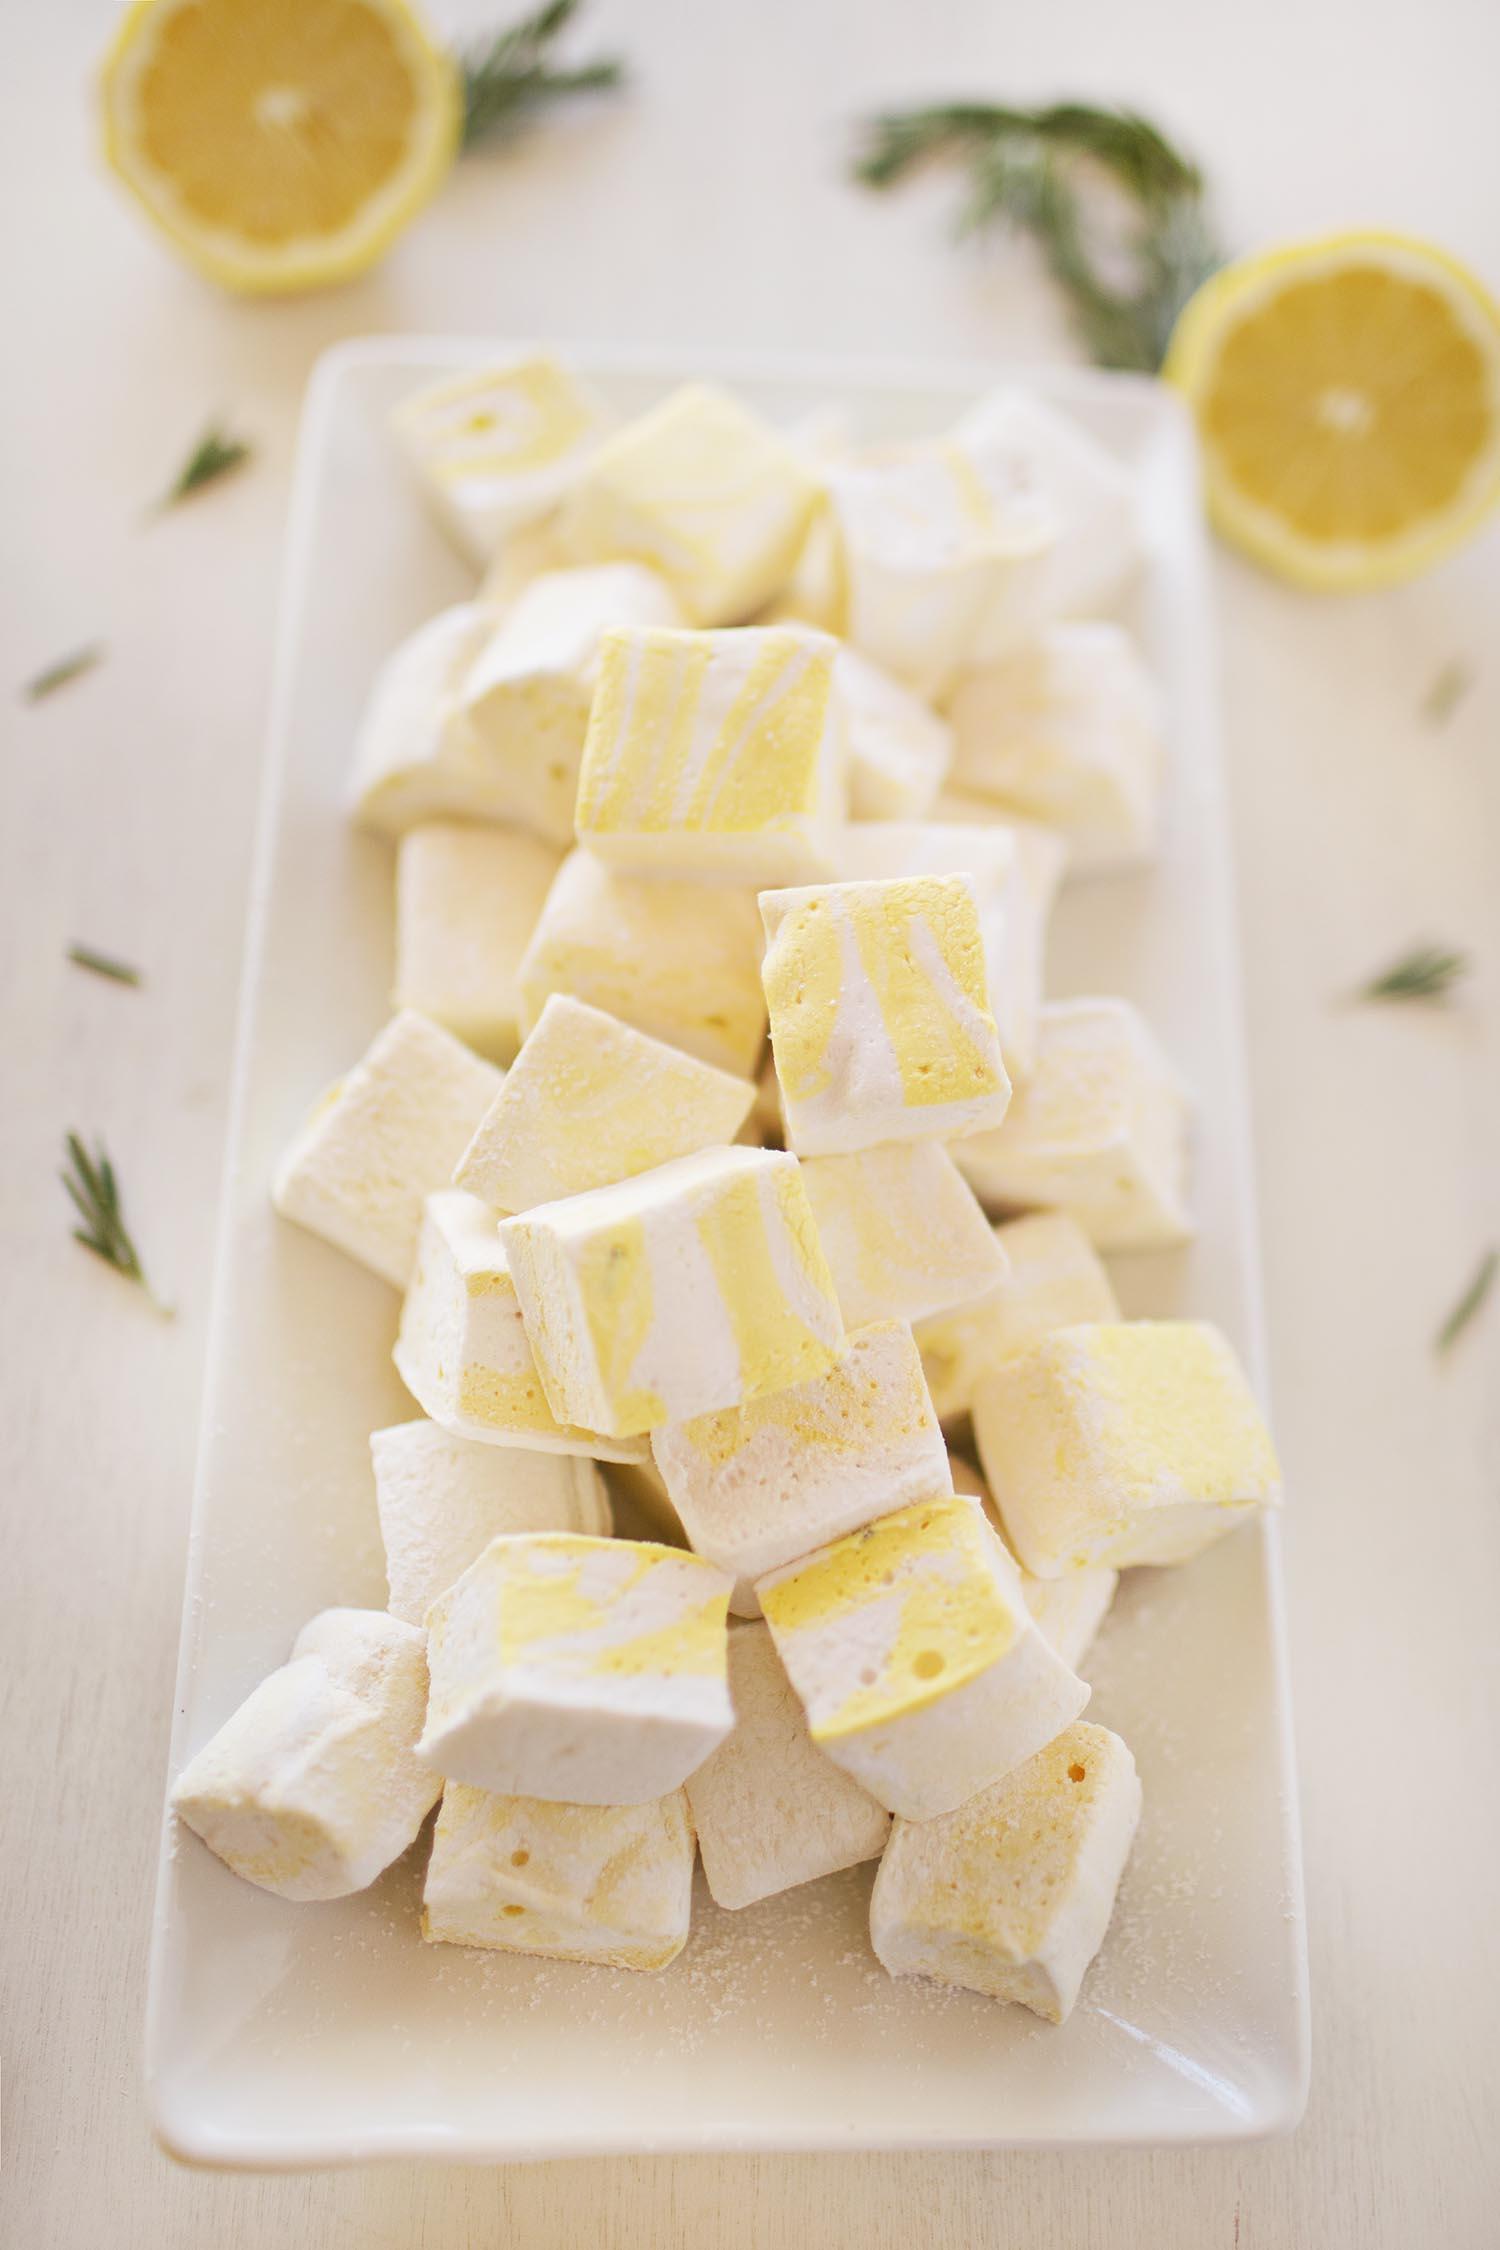 Lemon and Rosemary Marhmallows (via fitness-4all.com)